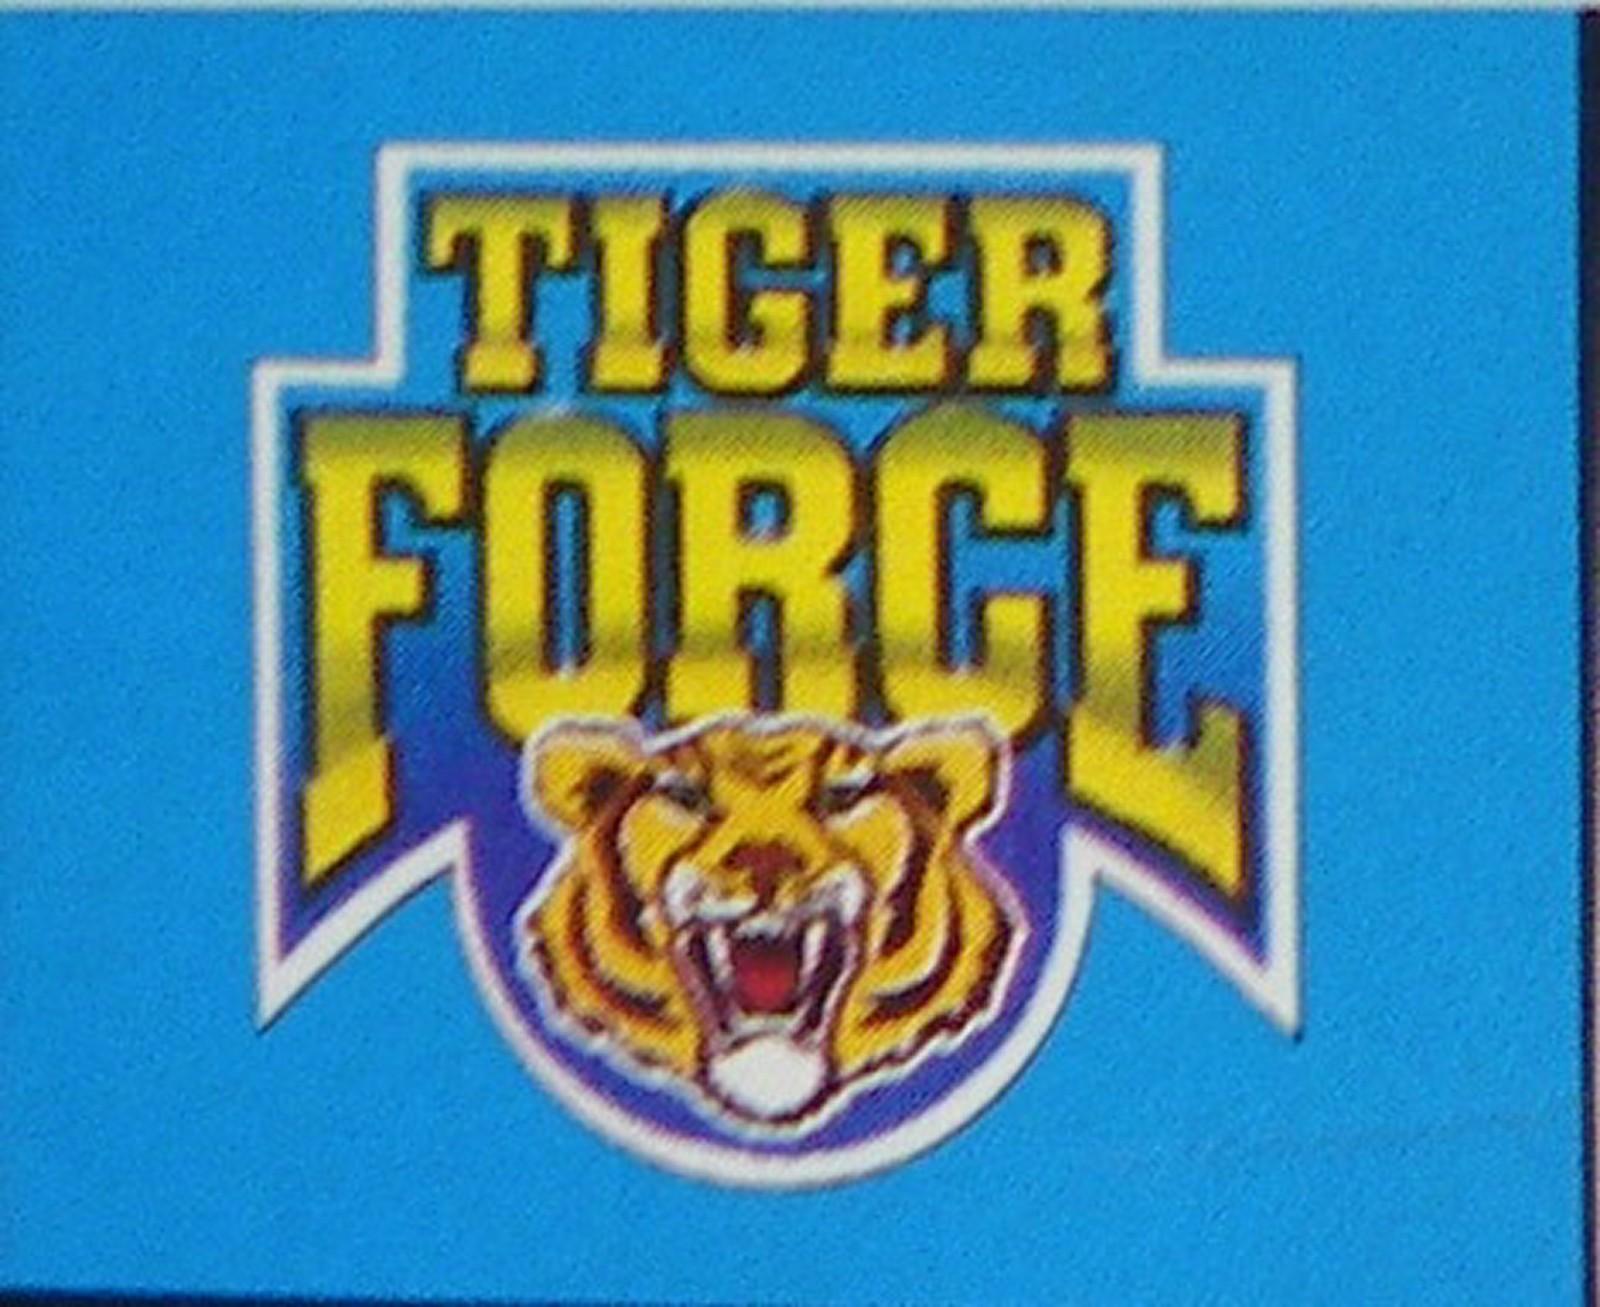 Tiger Force Logo photo - 1